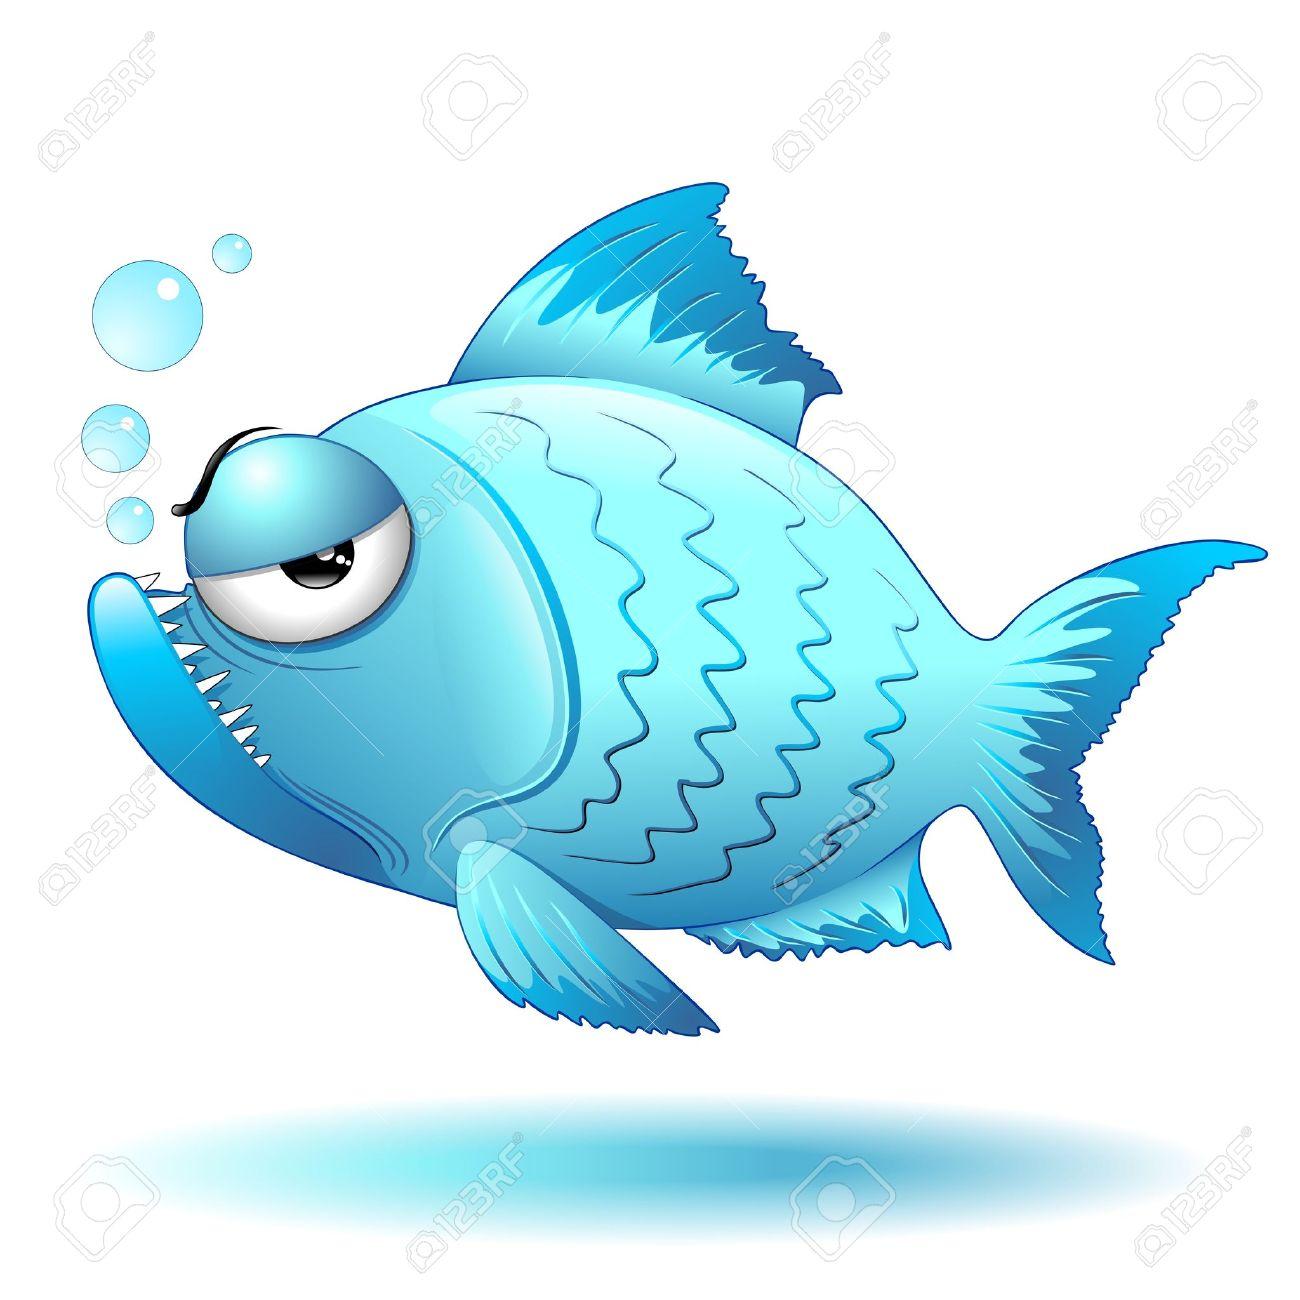 Grumpy Fish Cartoon Stock Vector - 21490508